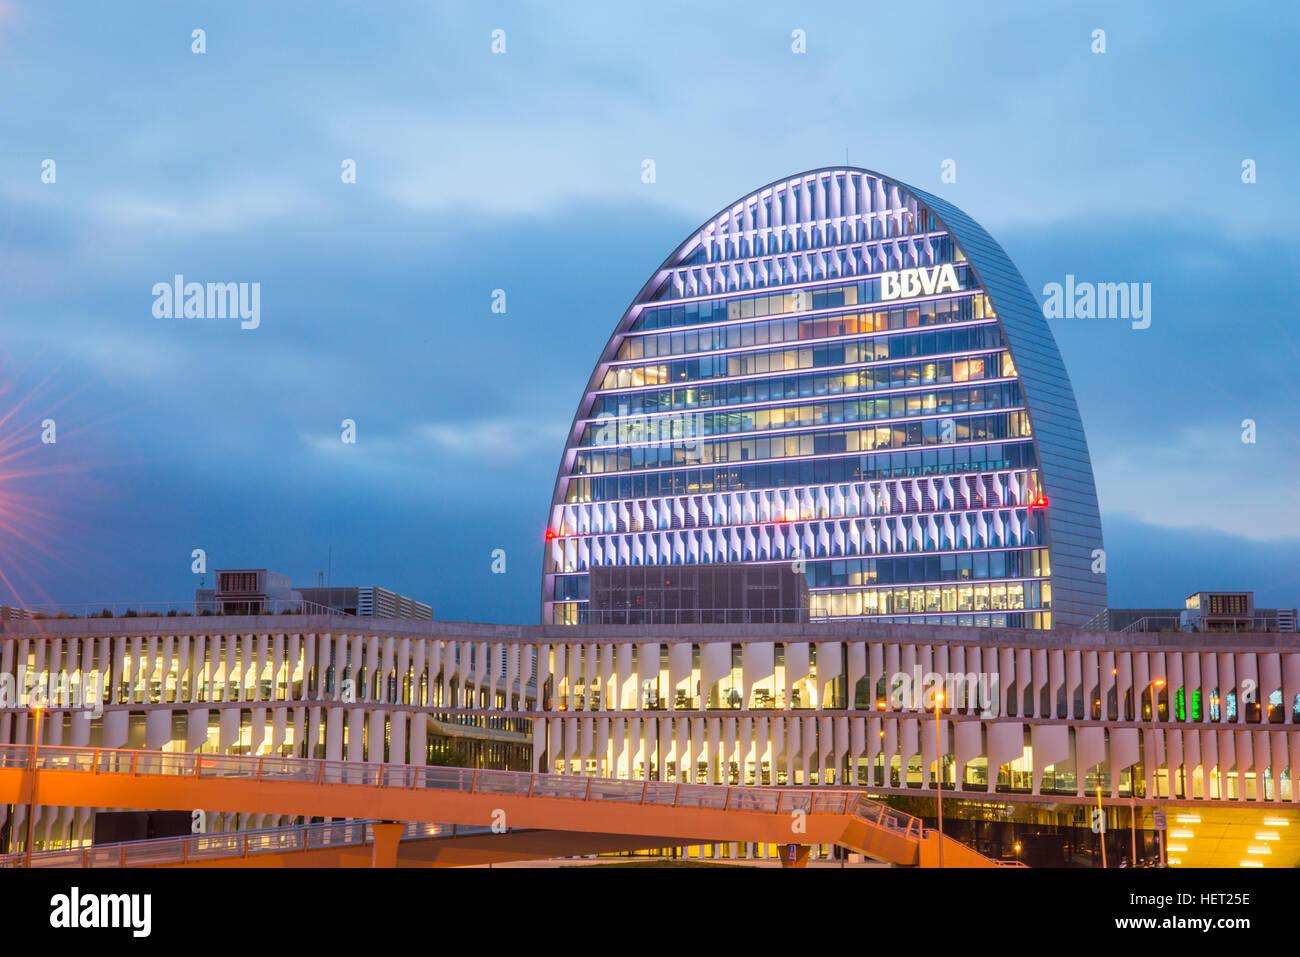 La Vela building, night view. Sanchinarro, Madrid, Spain. - Stock Image